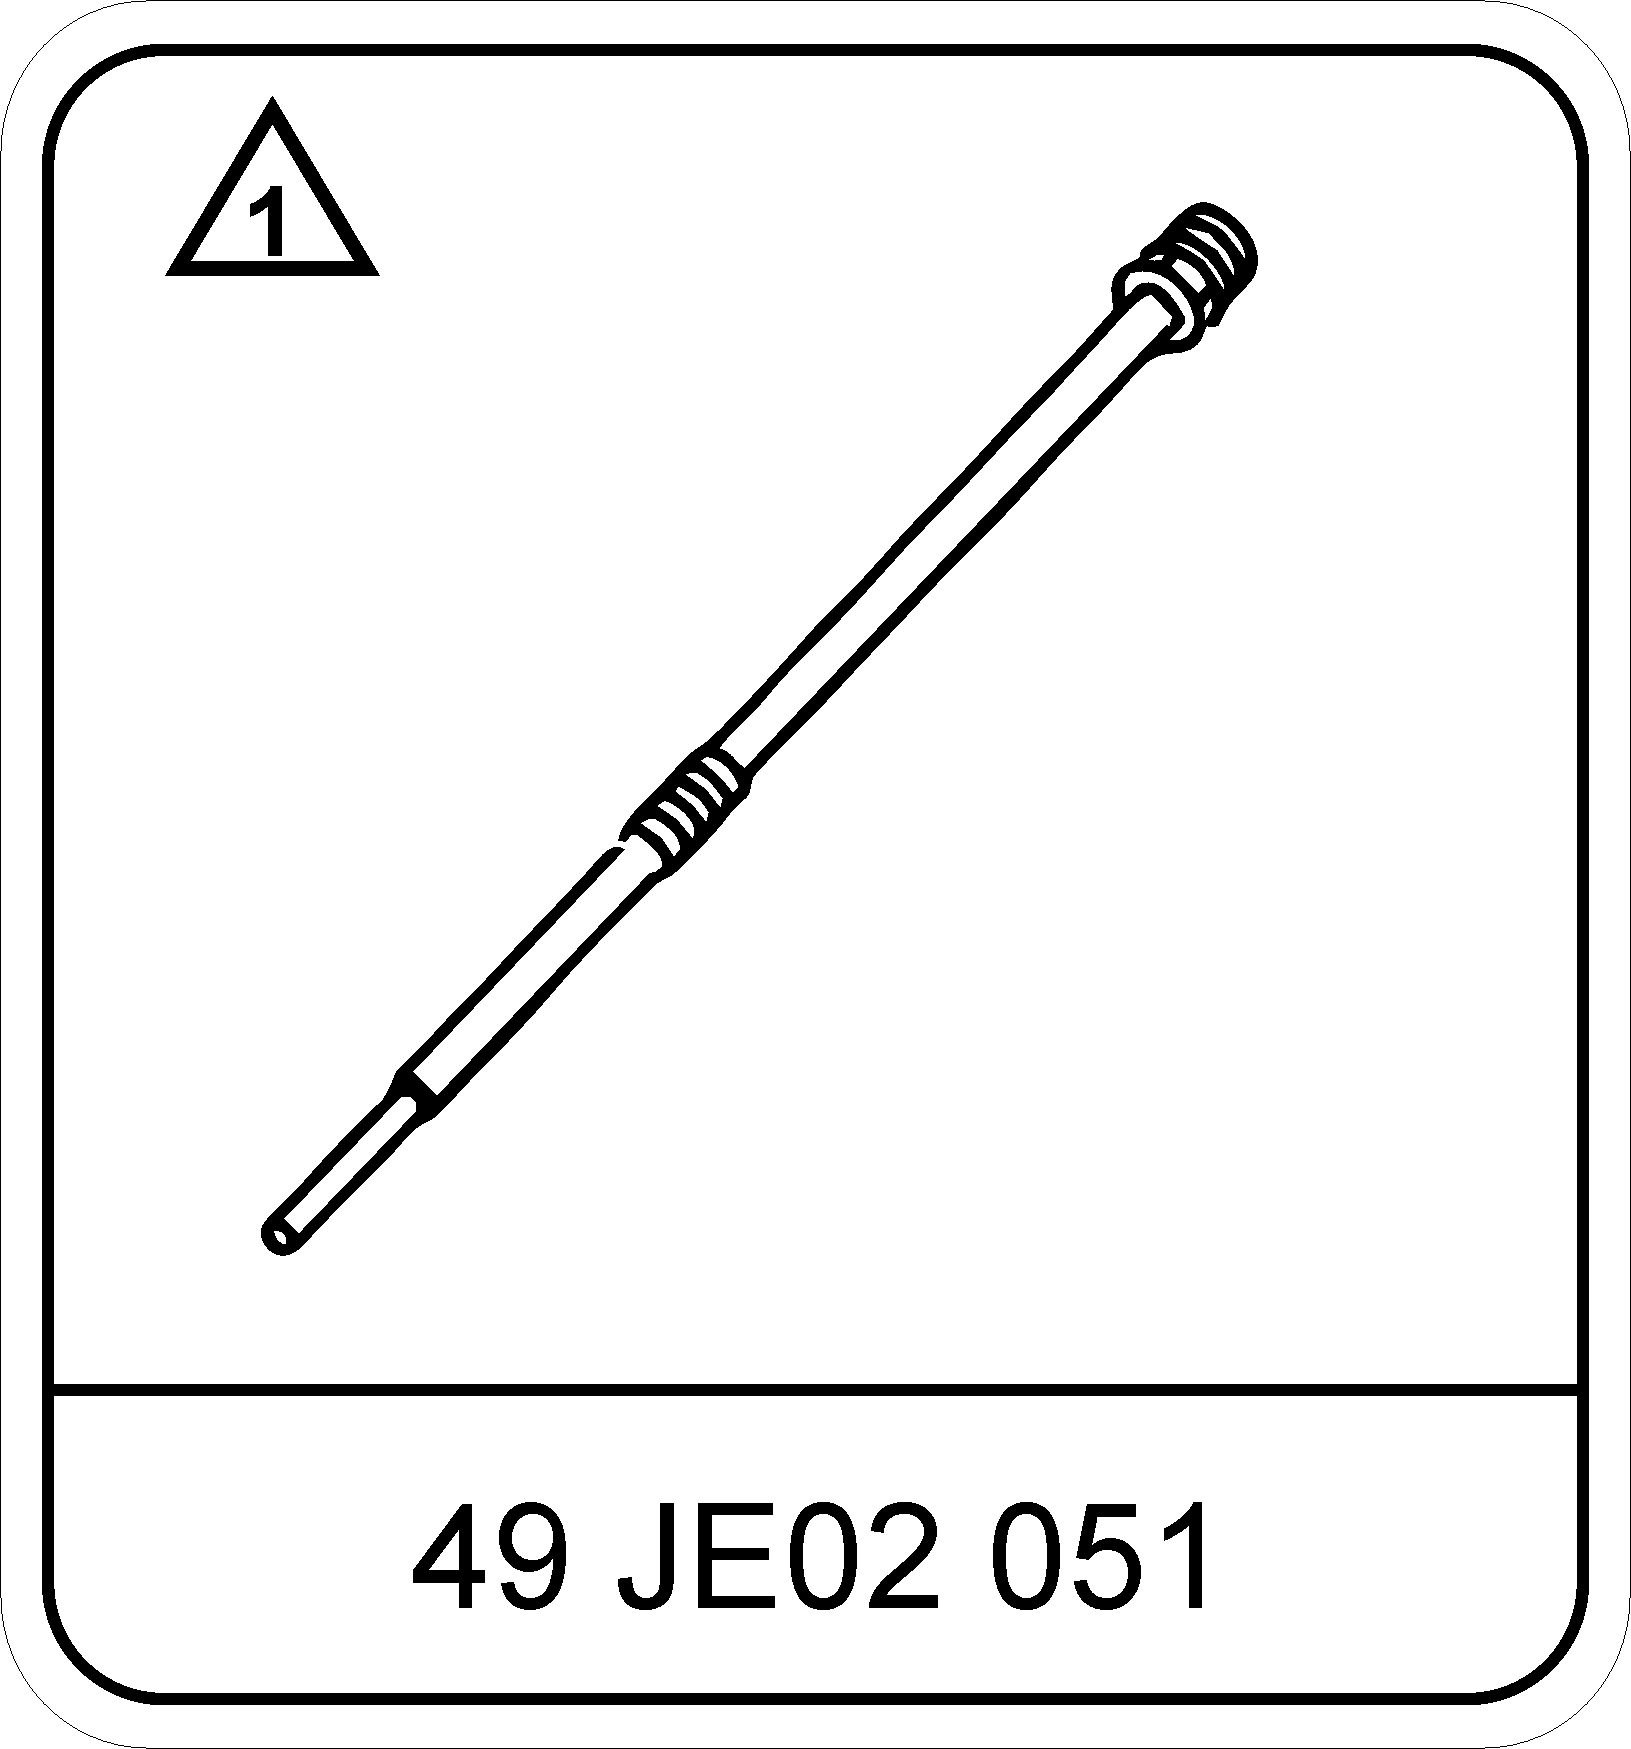 49-je02-051.png